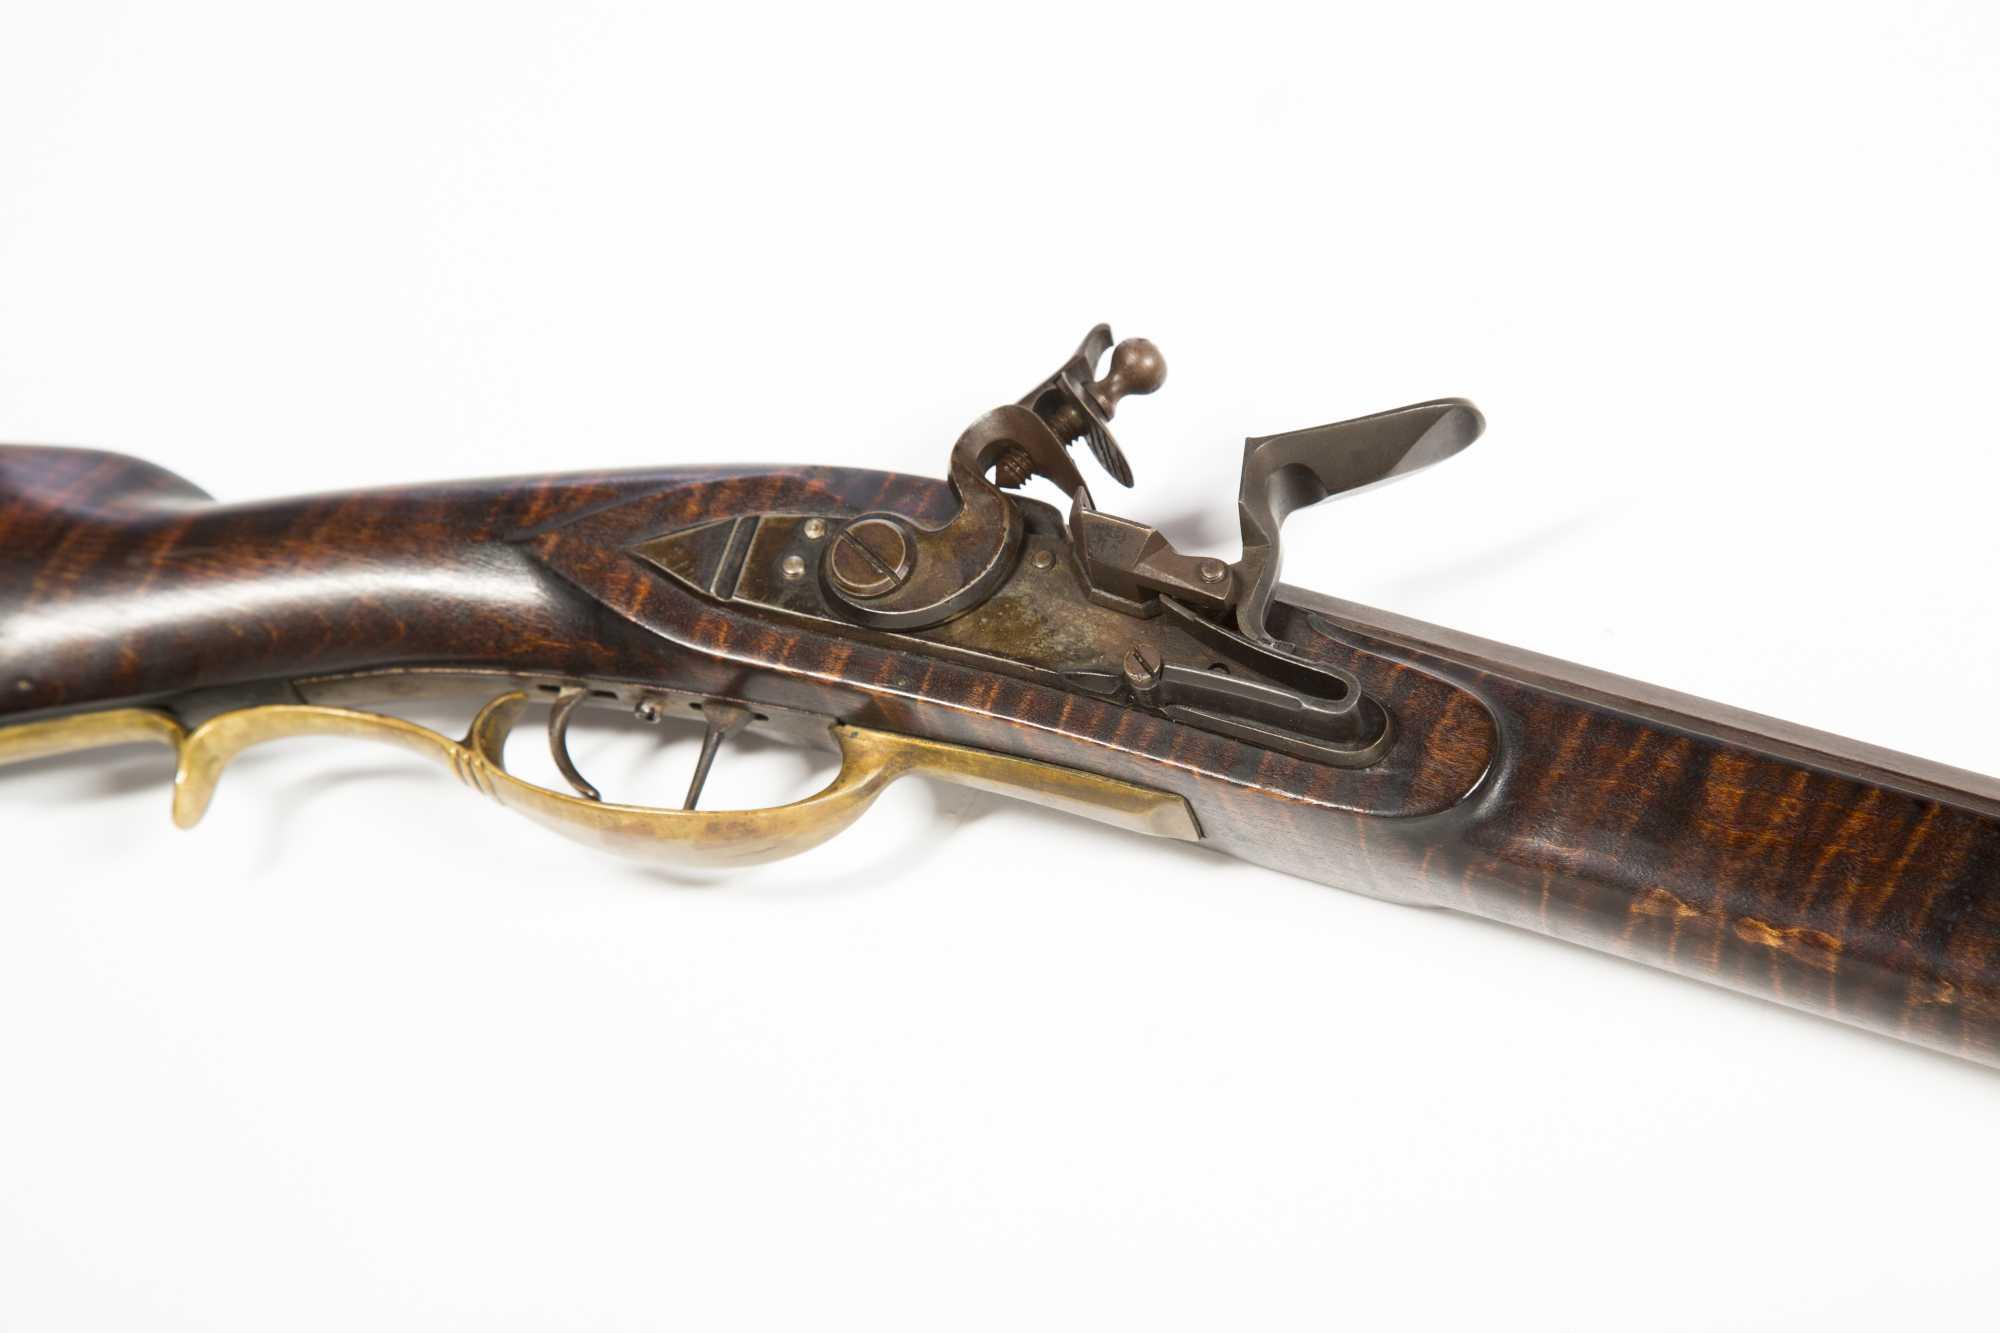 Reproduction Kentucky Flintlock Rifle with 41